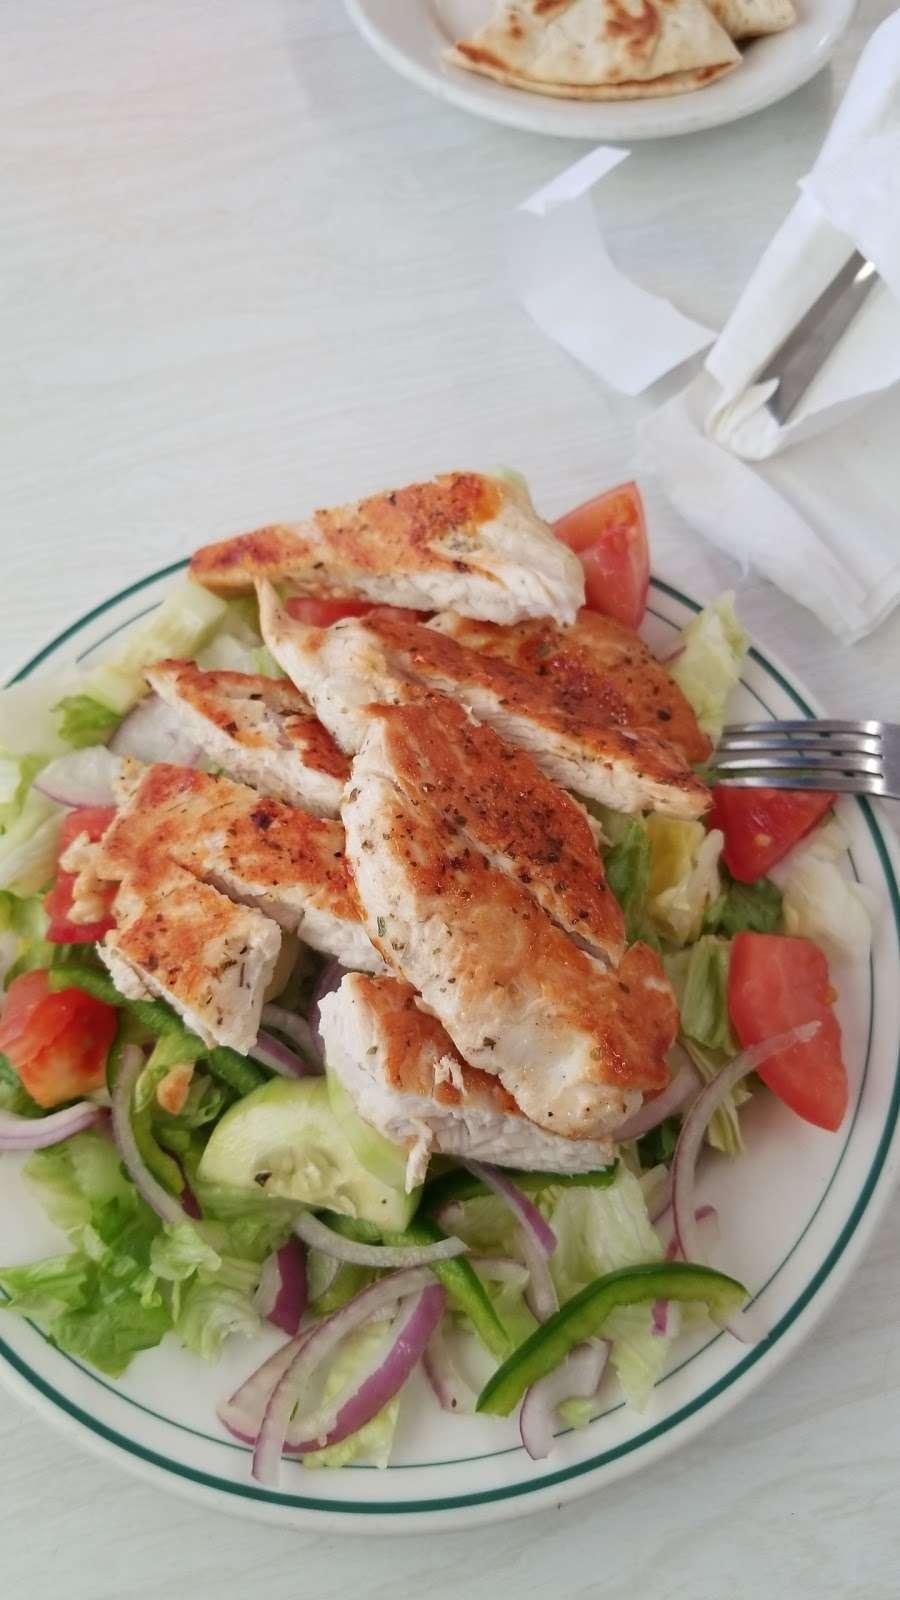 Truck Stop Diner - restaurant  | Photo 10 of 10 | Address: 1 Hackensack Ave, Kearny, NJ 07032, USA | Phone: (973) 344-4098